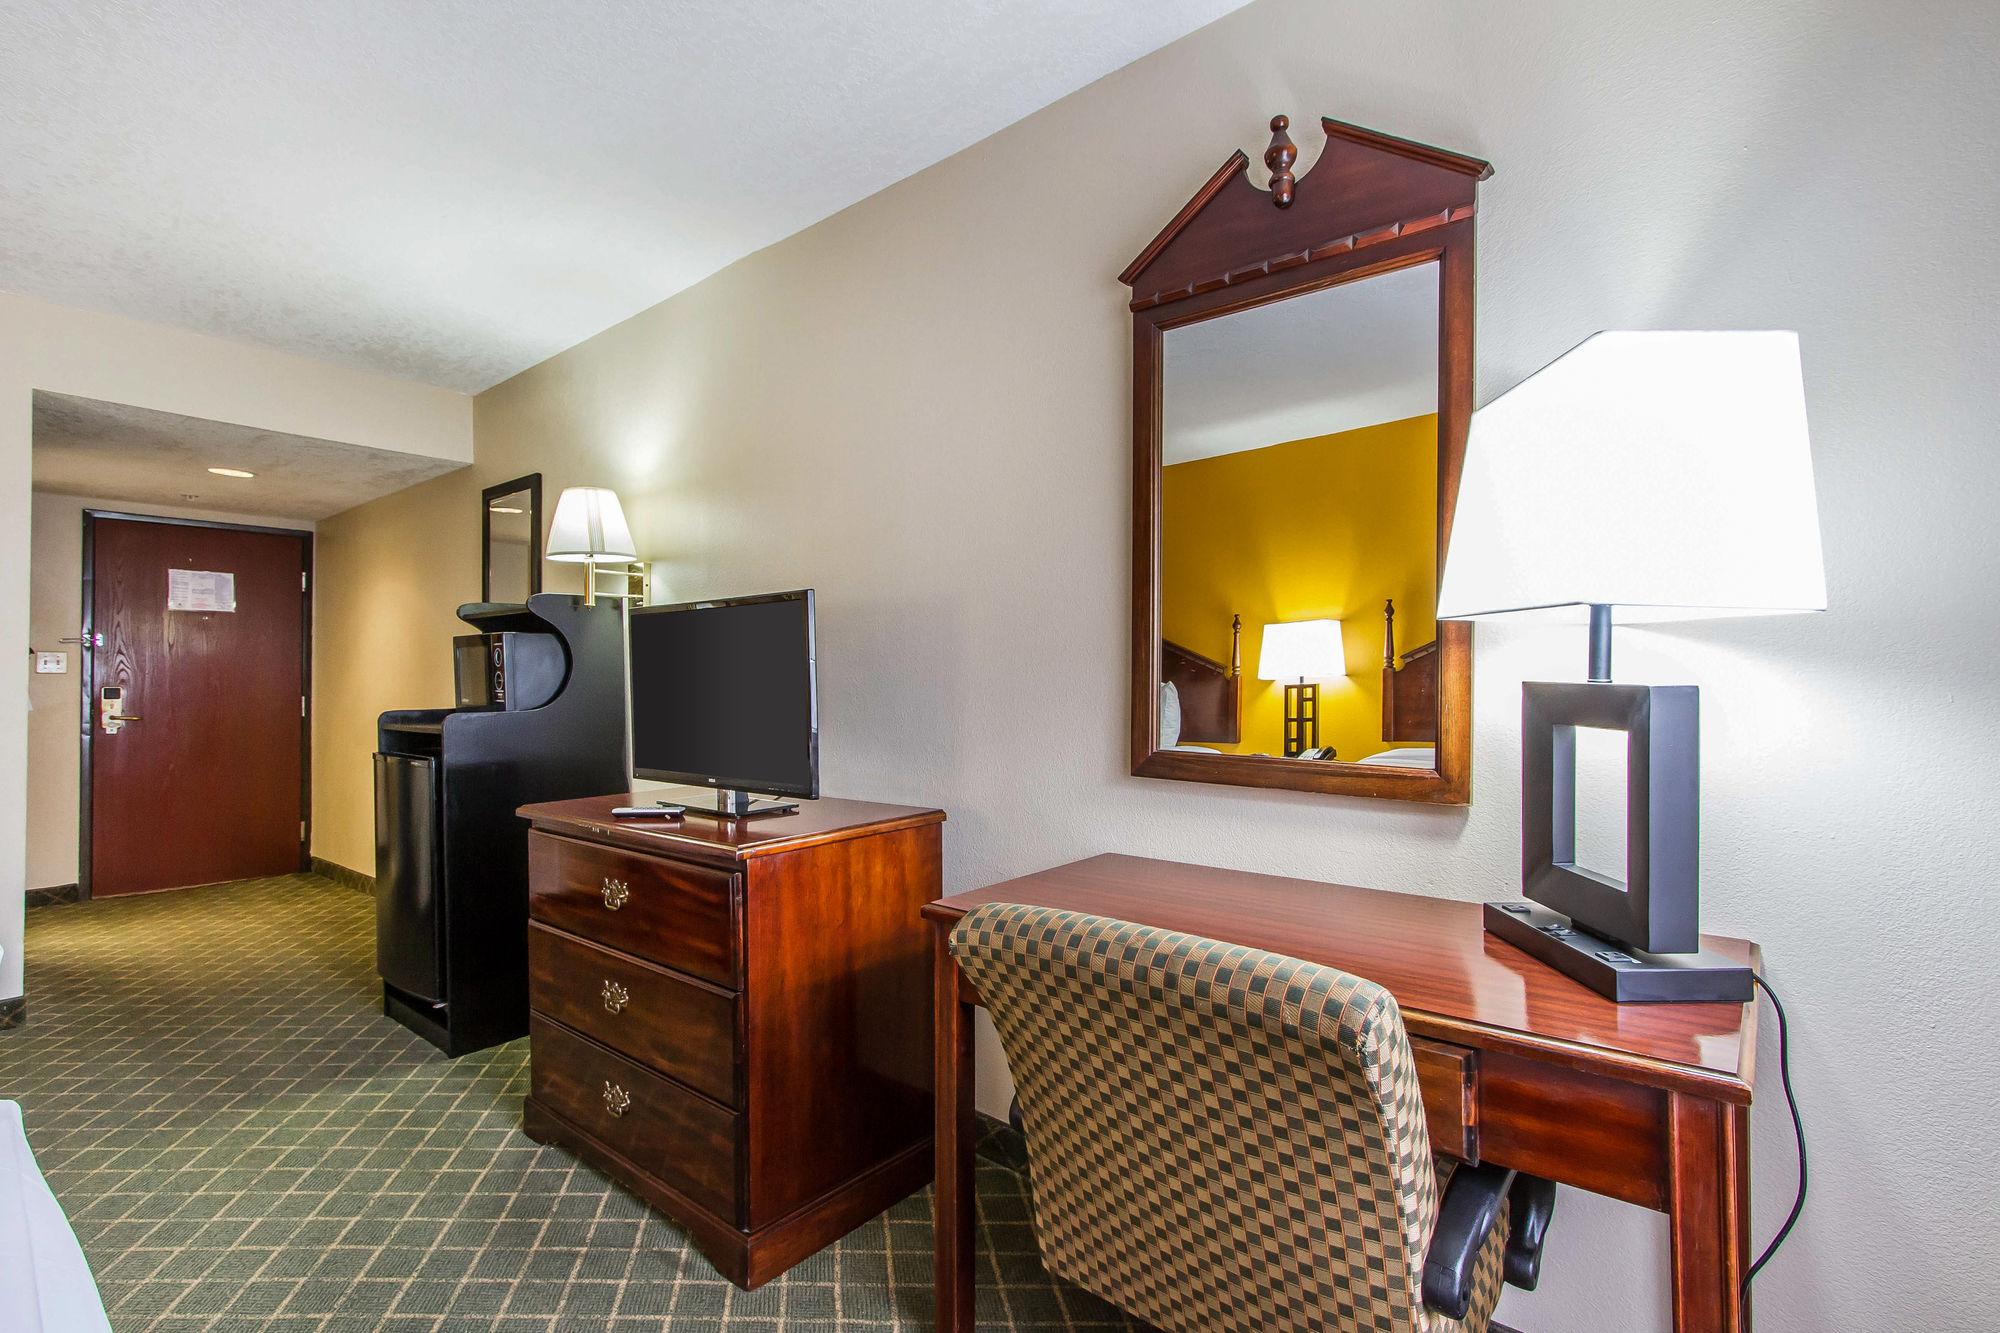 Quality Inn in Saraland, AL